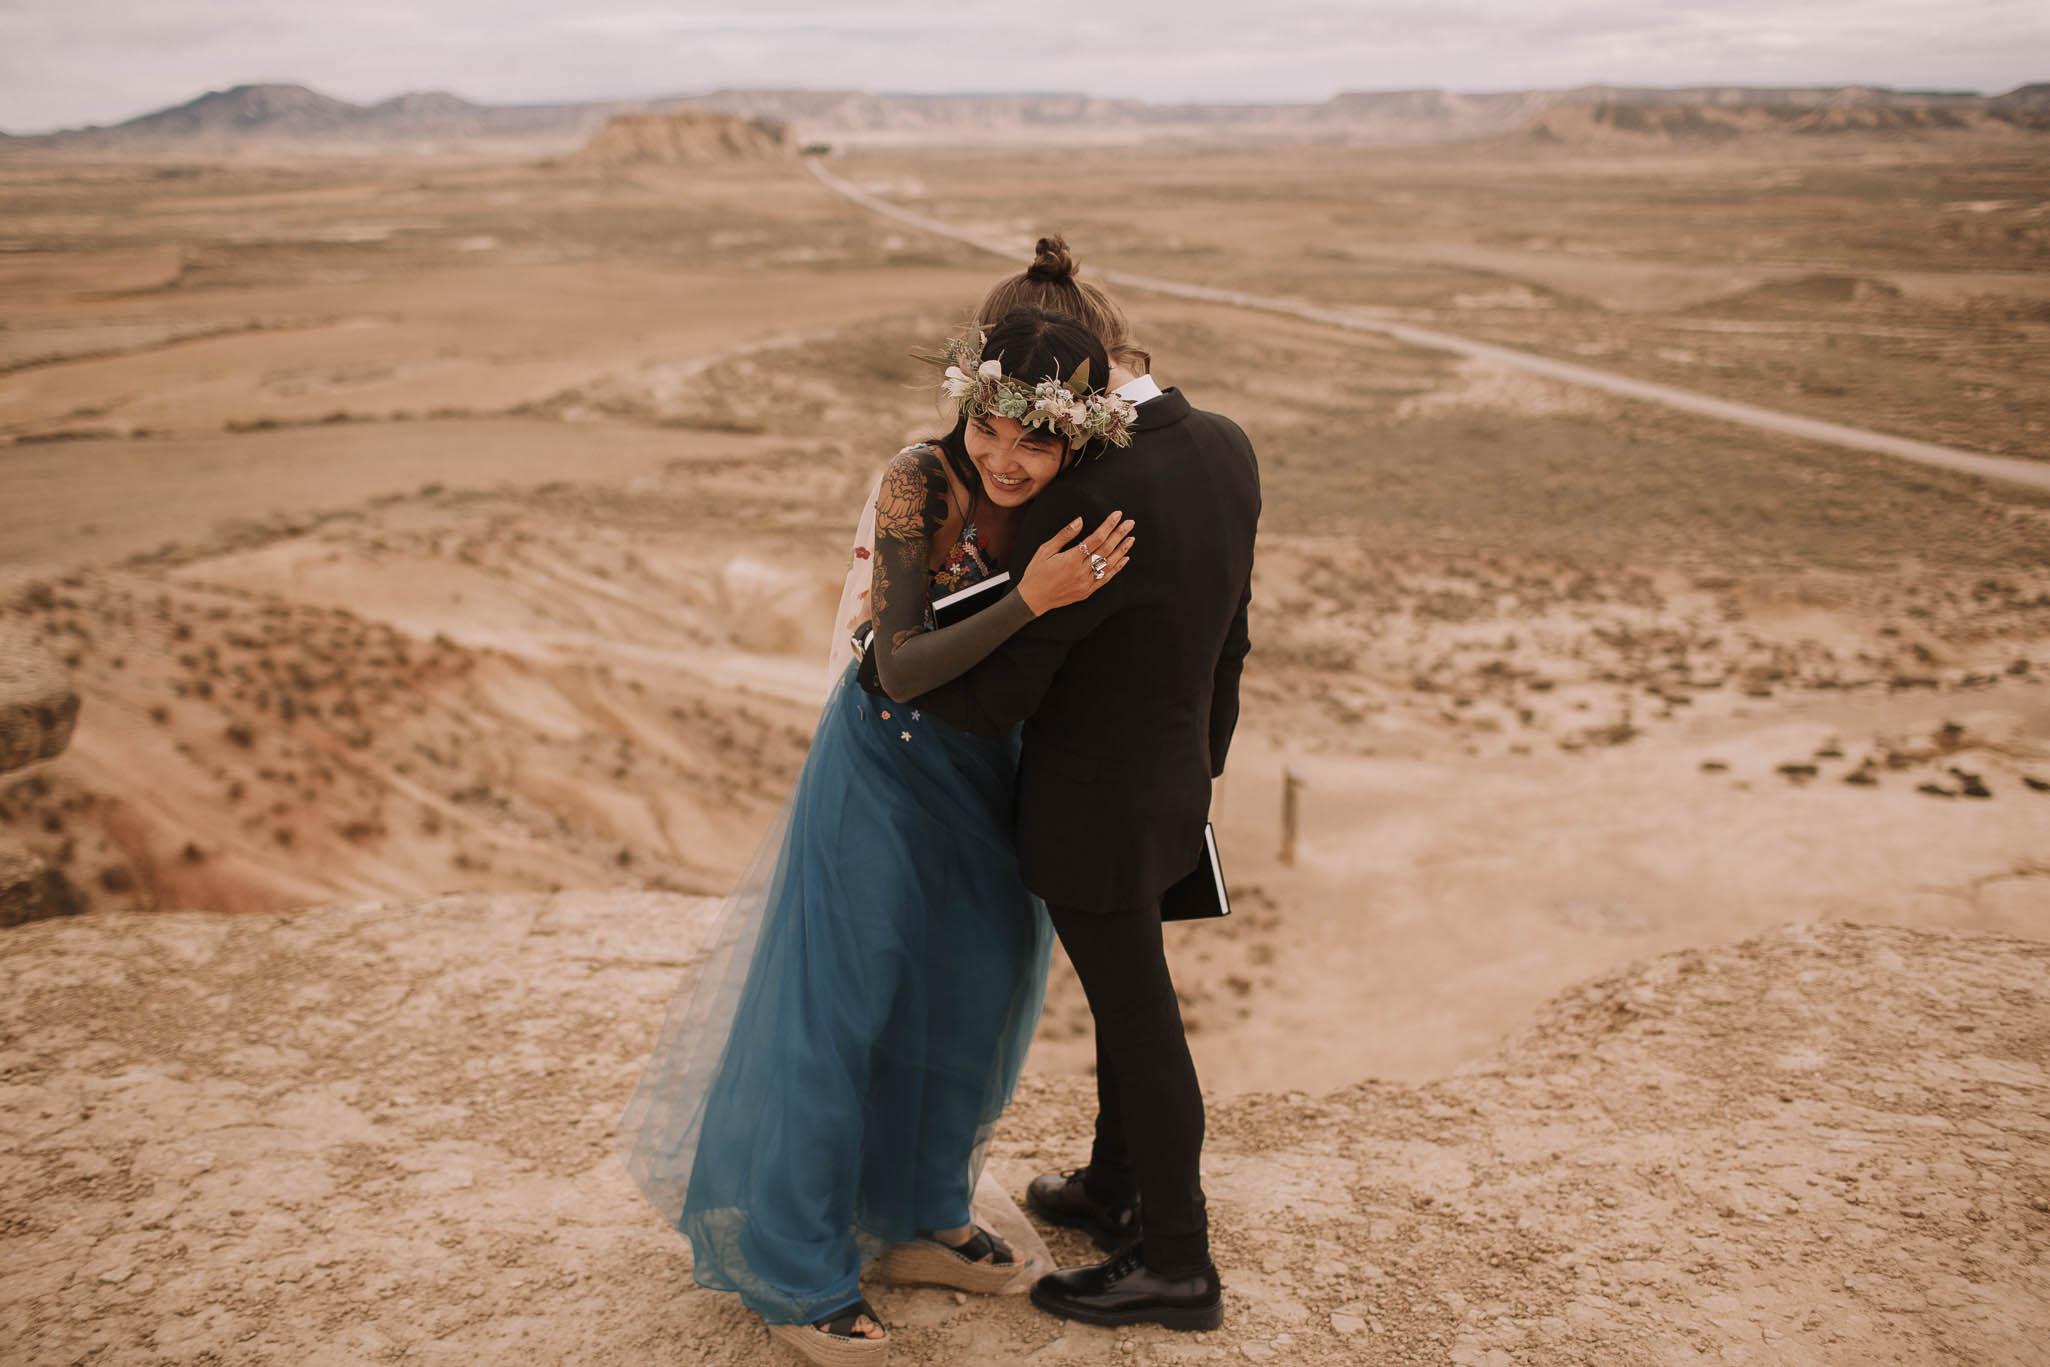 Spain-wedding-photographer-bardenas-reales-jeremy-boyer-photographe-mariage-bordeaux-floral-wedding-dress-robe-106.jpg